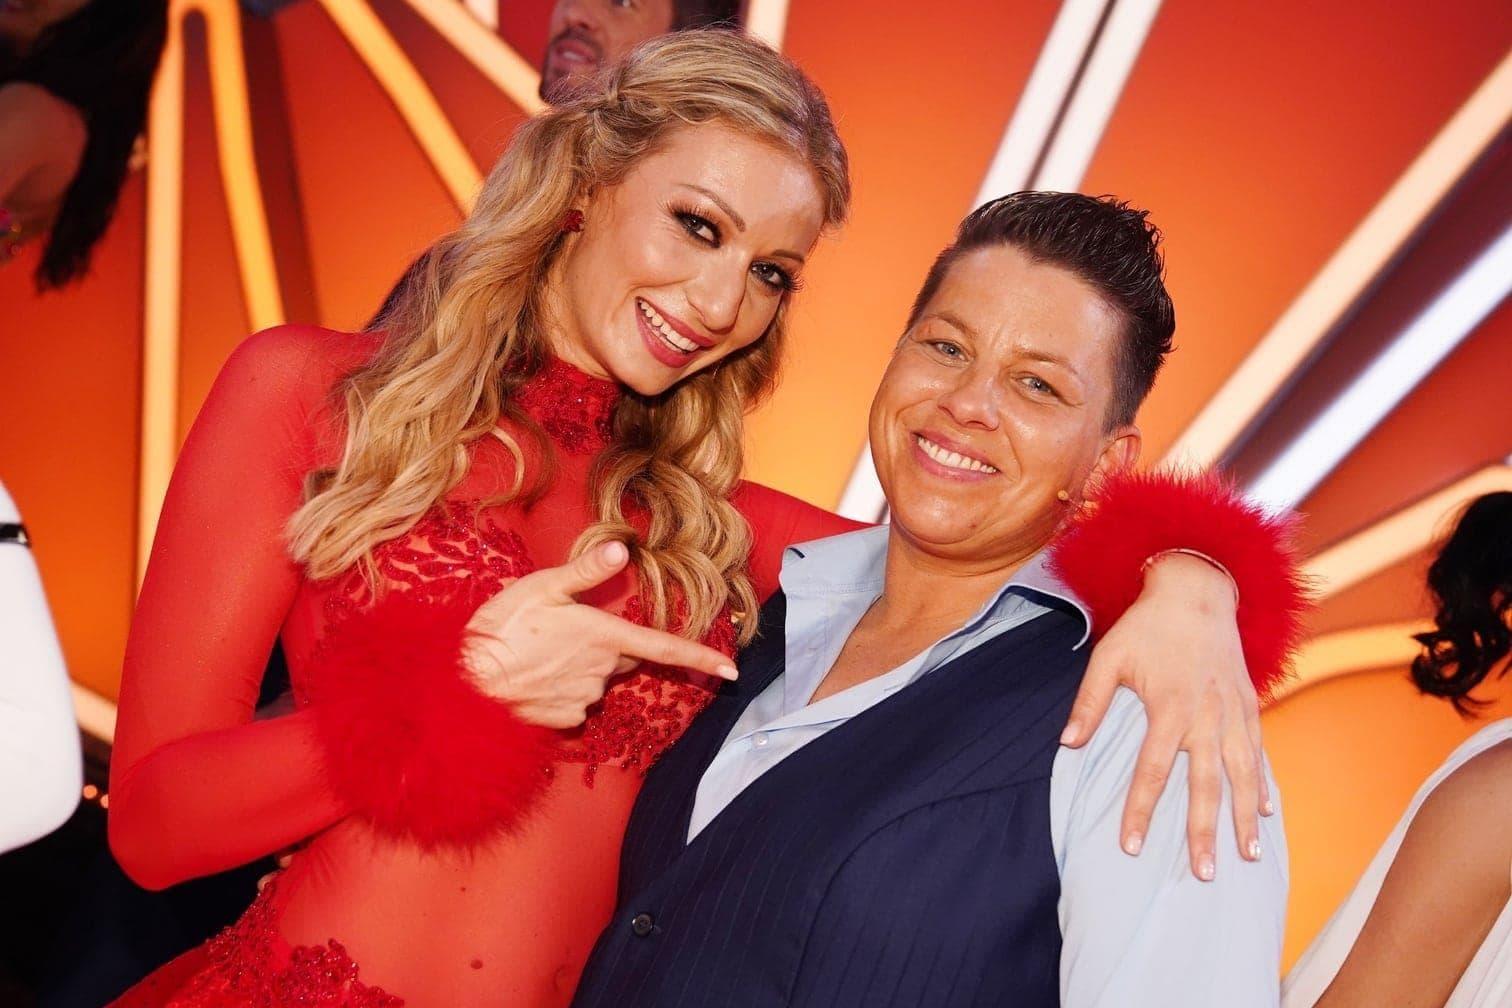 <p>Sängerin Kerstin Ott tanzt mit Regina Luca.</p> Foto: TVNOW / Gregorowius